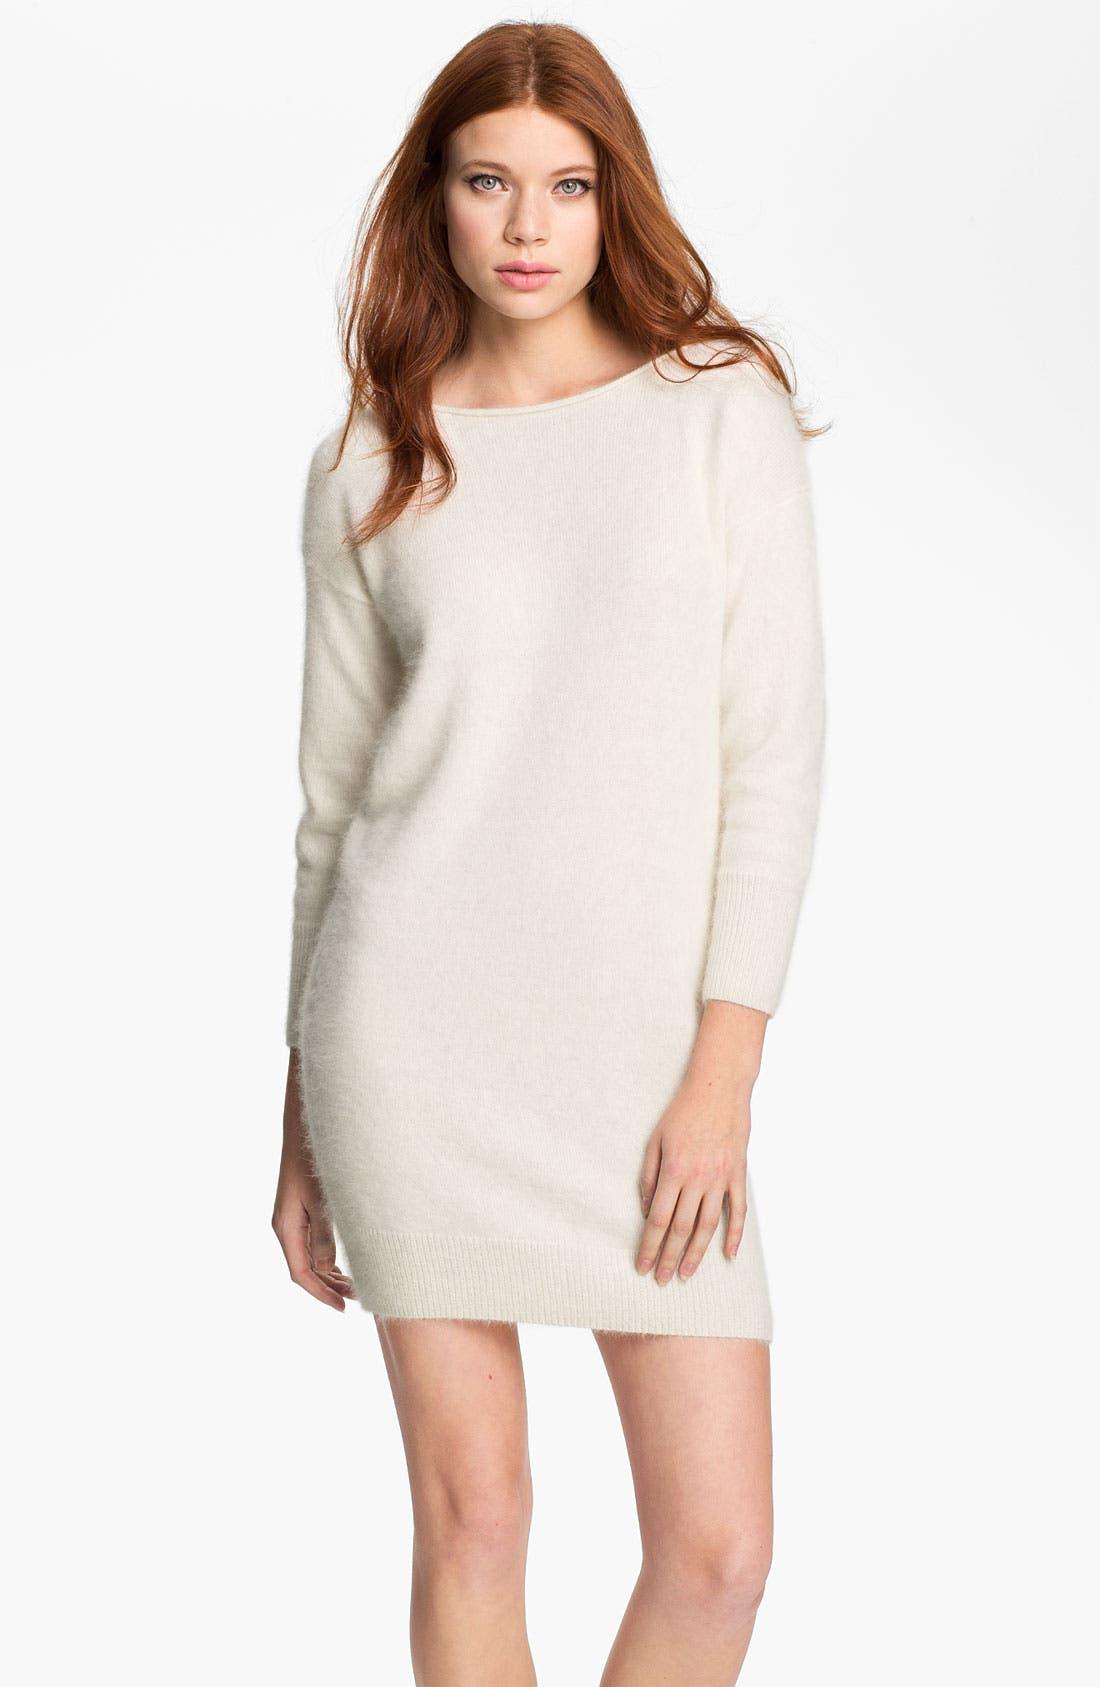 Alternate Image 1 Selected - Juicy Couture Angora Sweater Dress